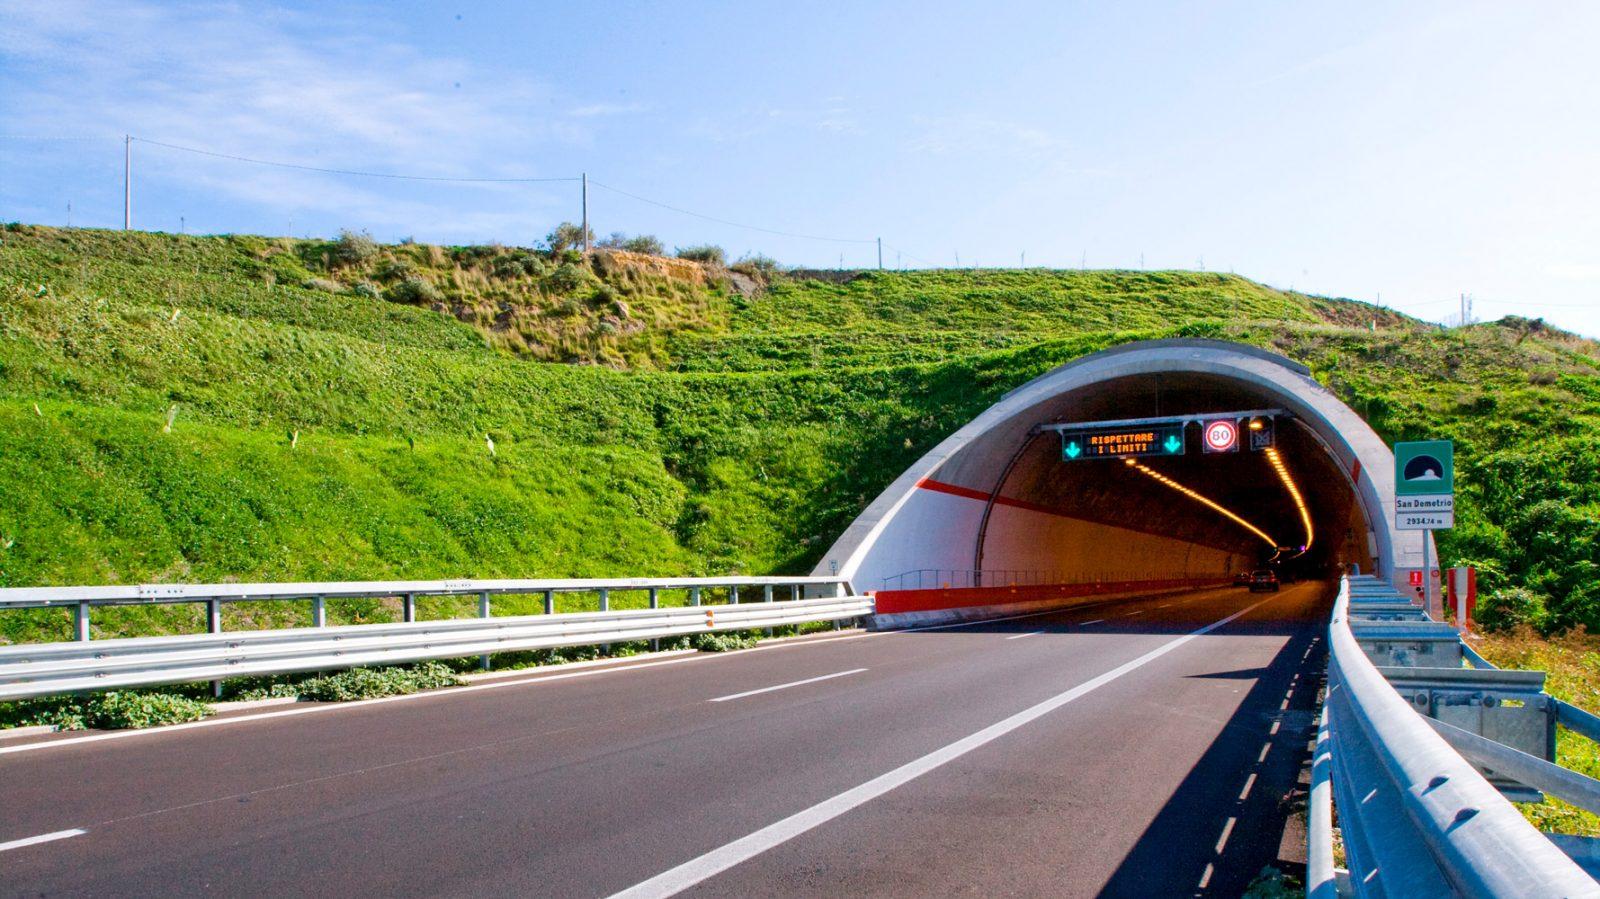 Sicilia, autostrada Catania-Siracusa, galleria San Demetrio (Archivio storico Anas)